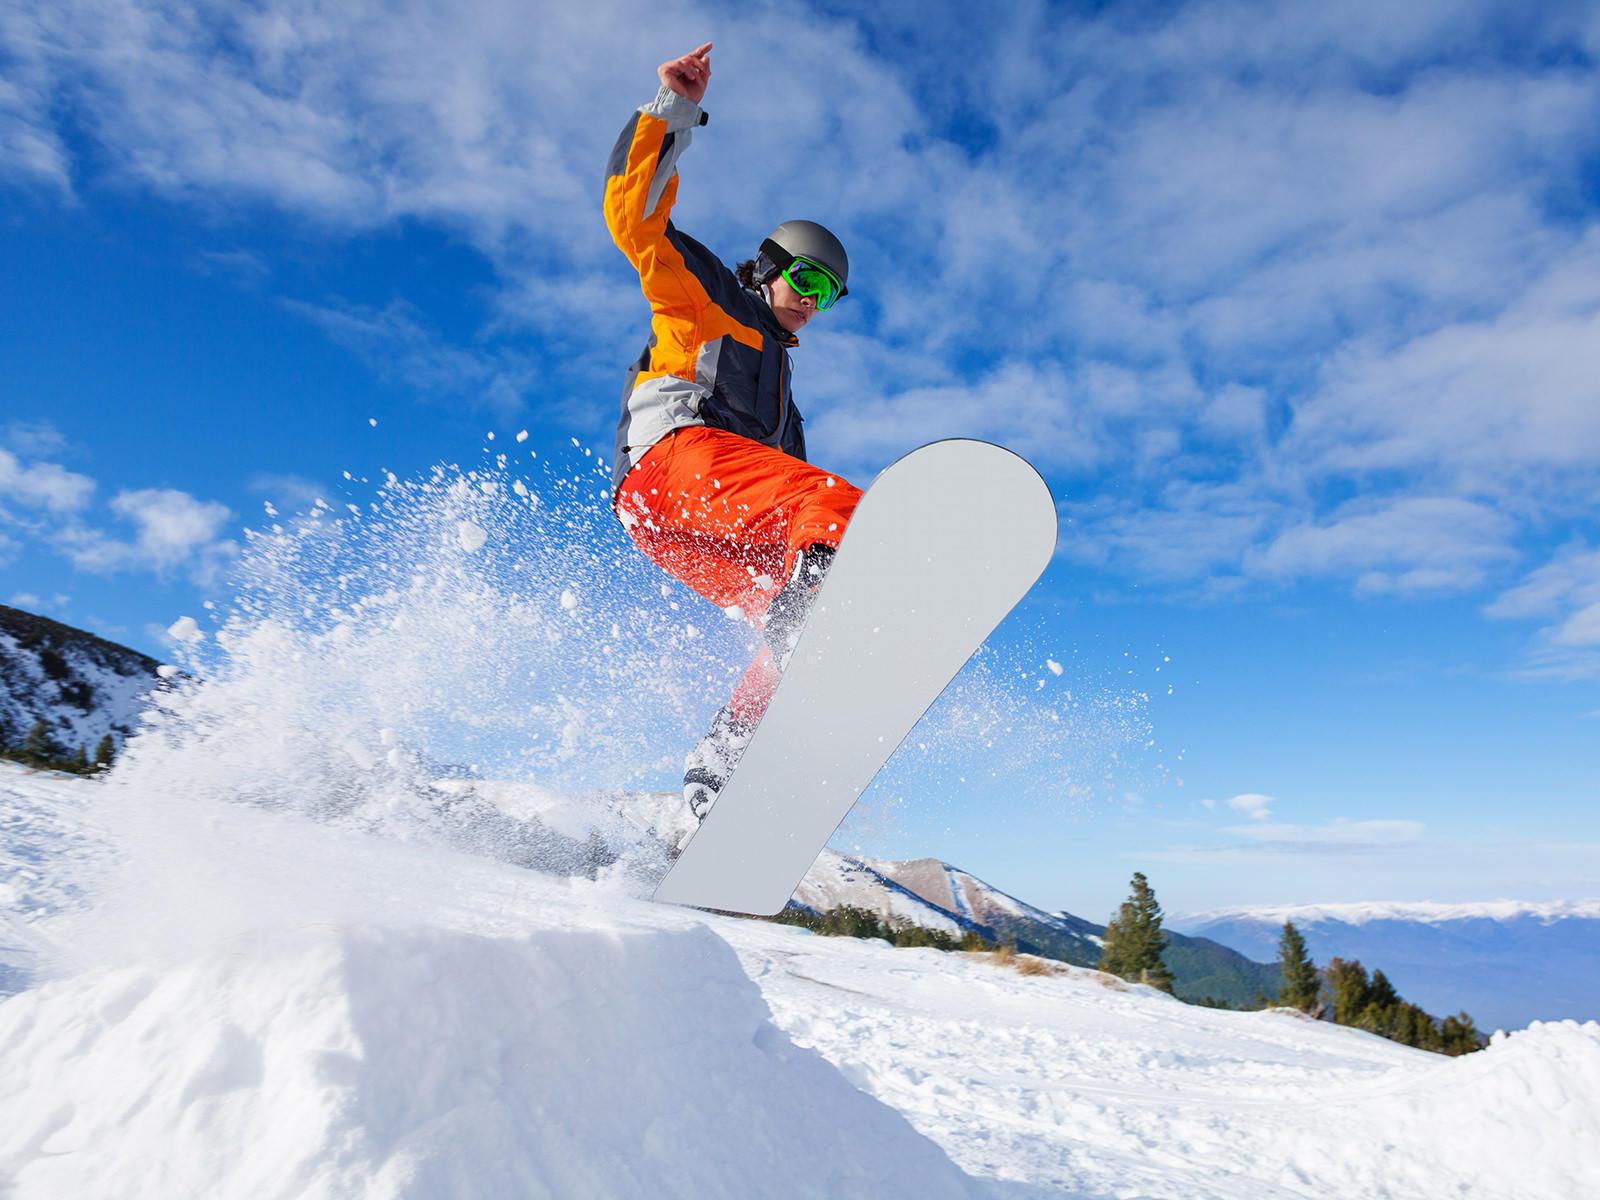 Bogus Basin Snowboarder